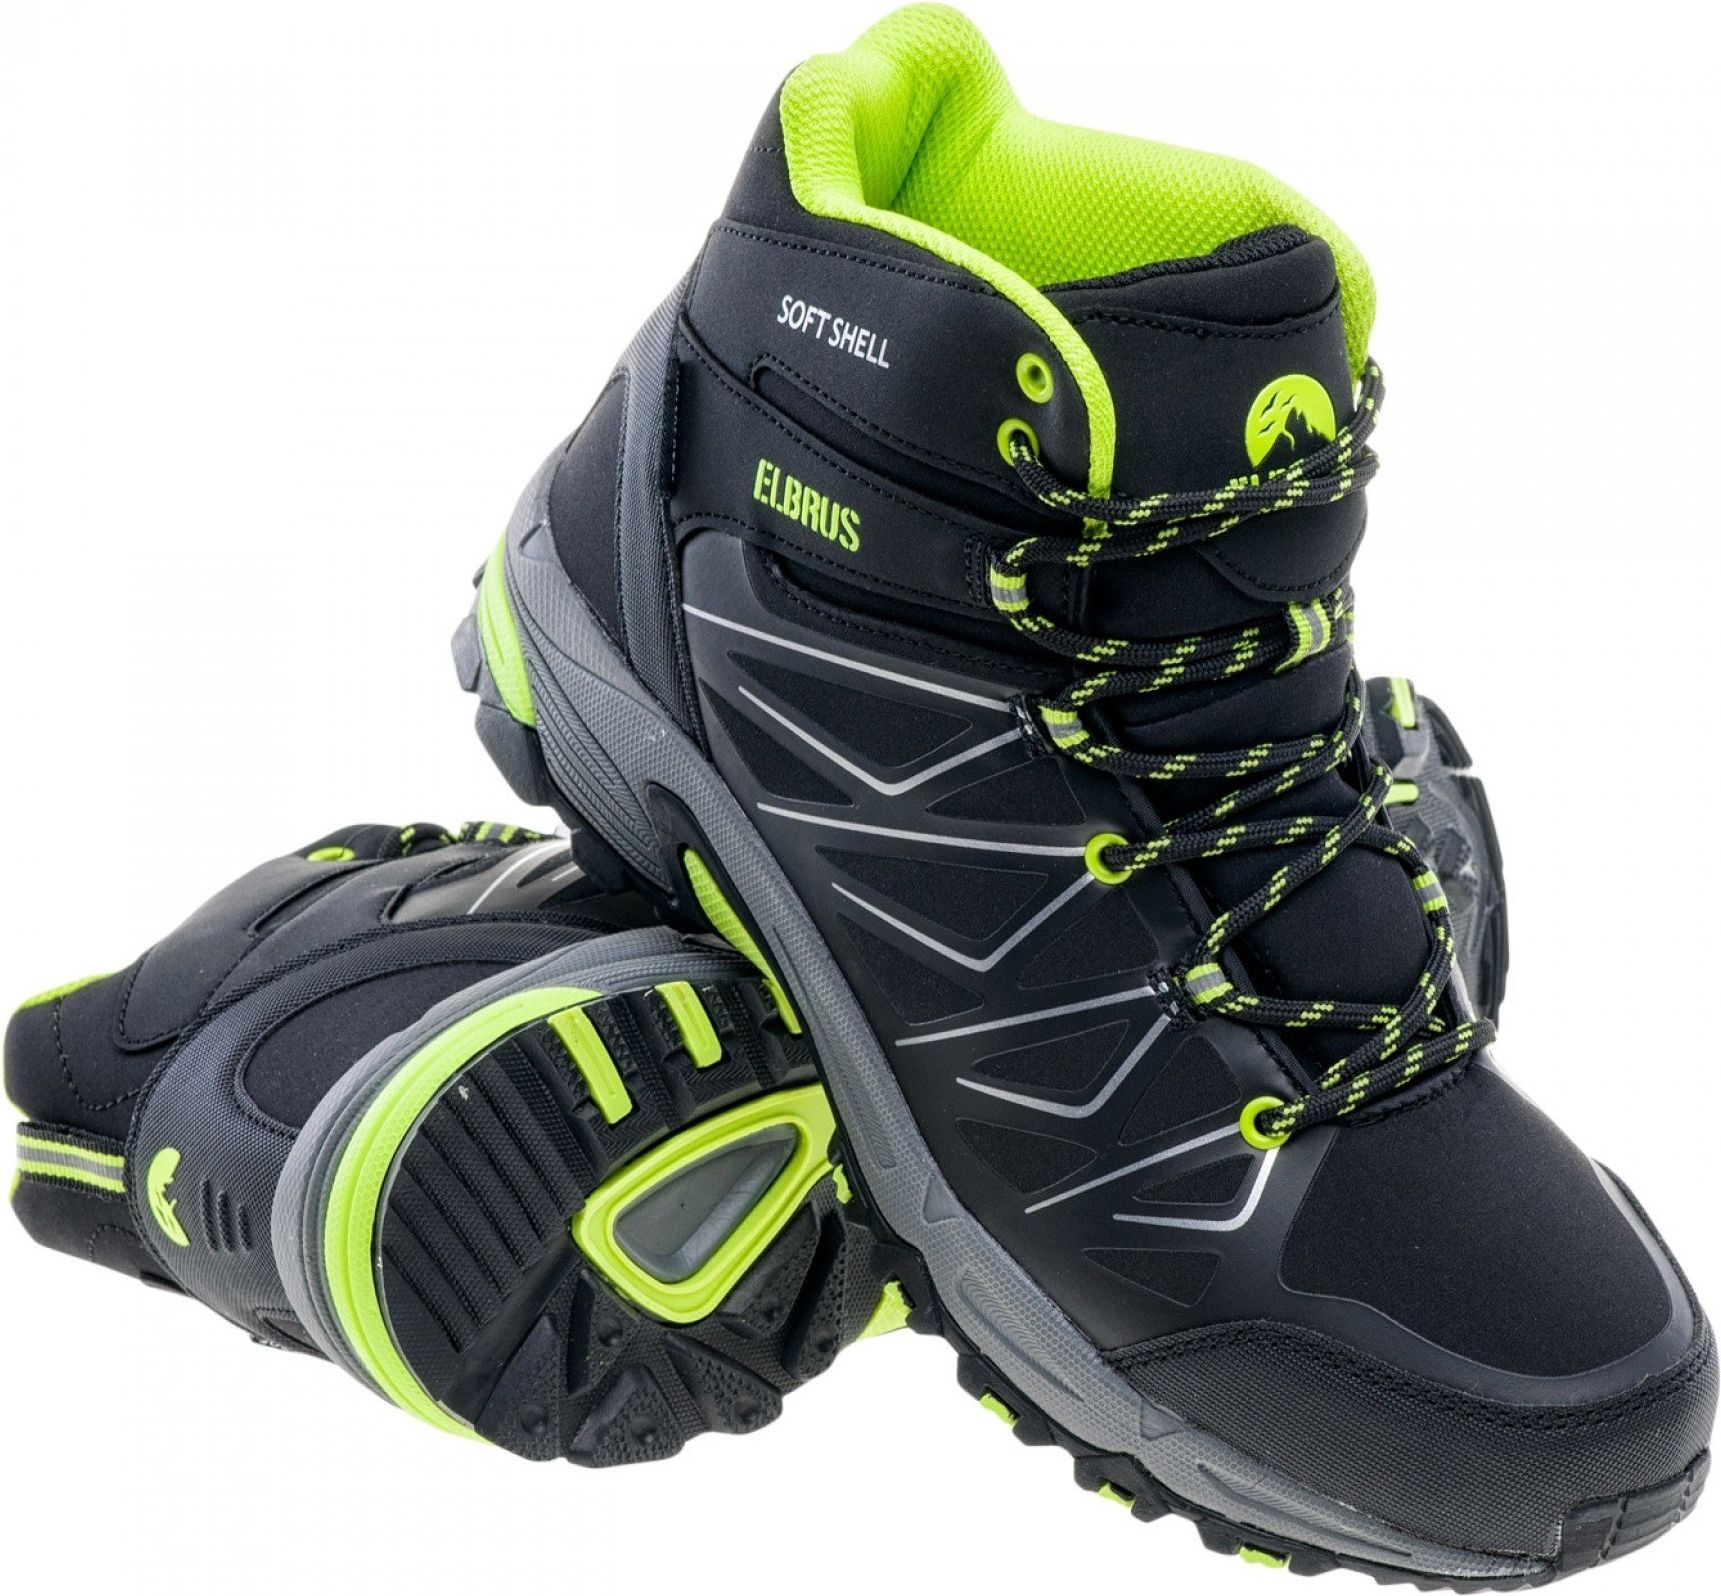 Elbrus Buty meskie Gabby Mid WP Black/Lime r. 42 1632637 Tūrisma apavi